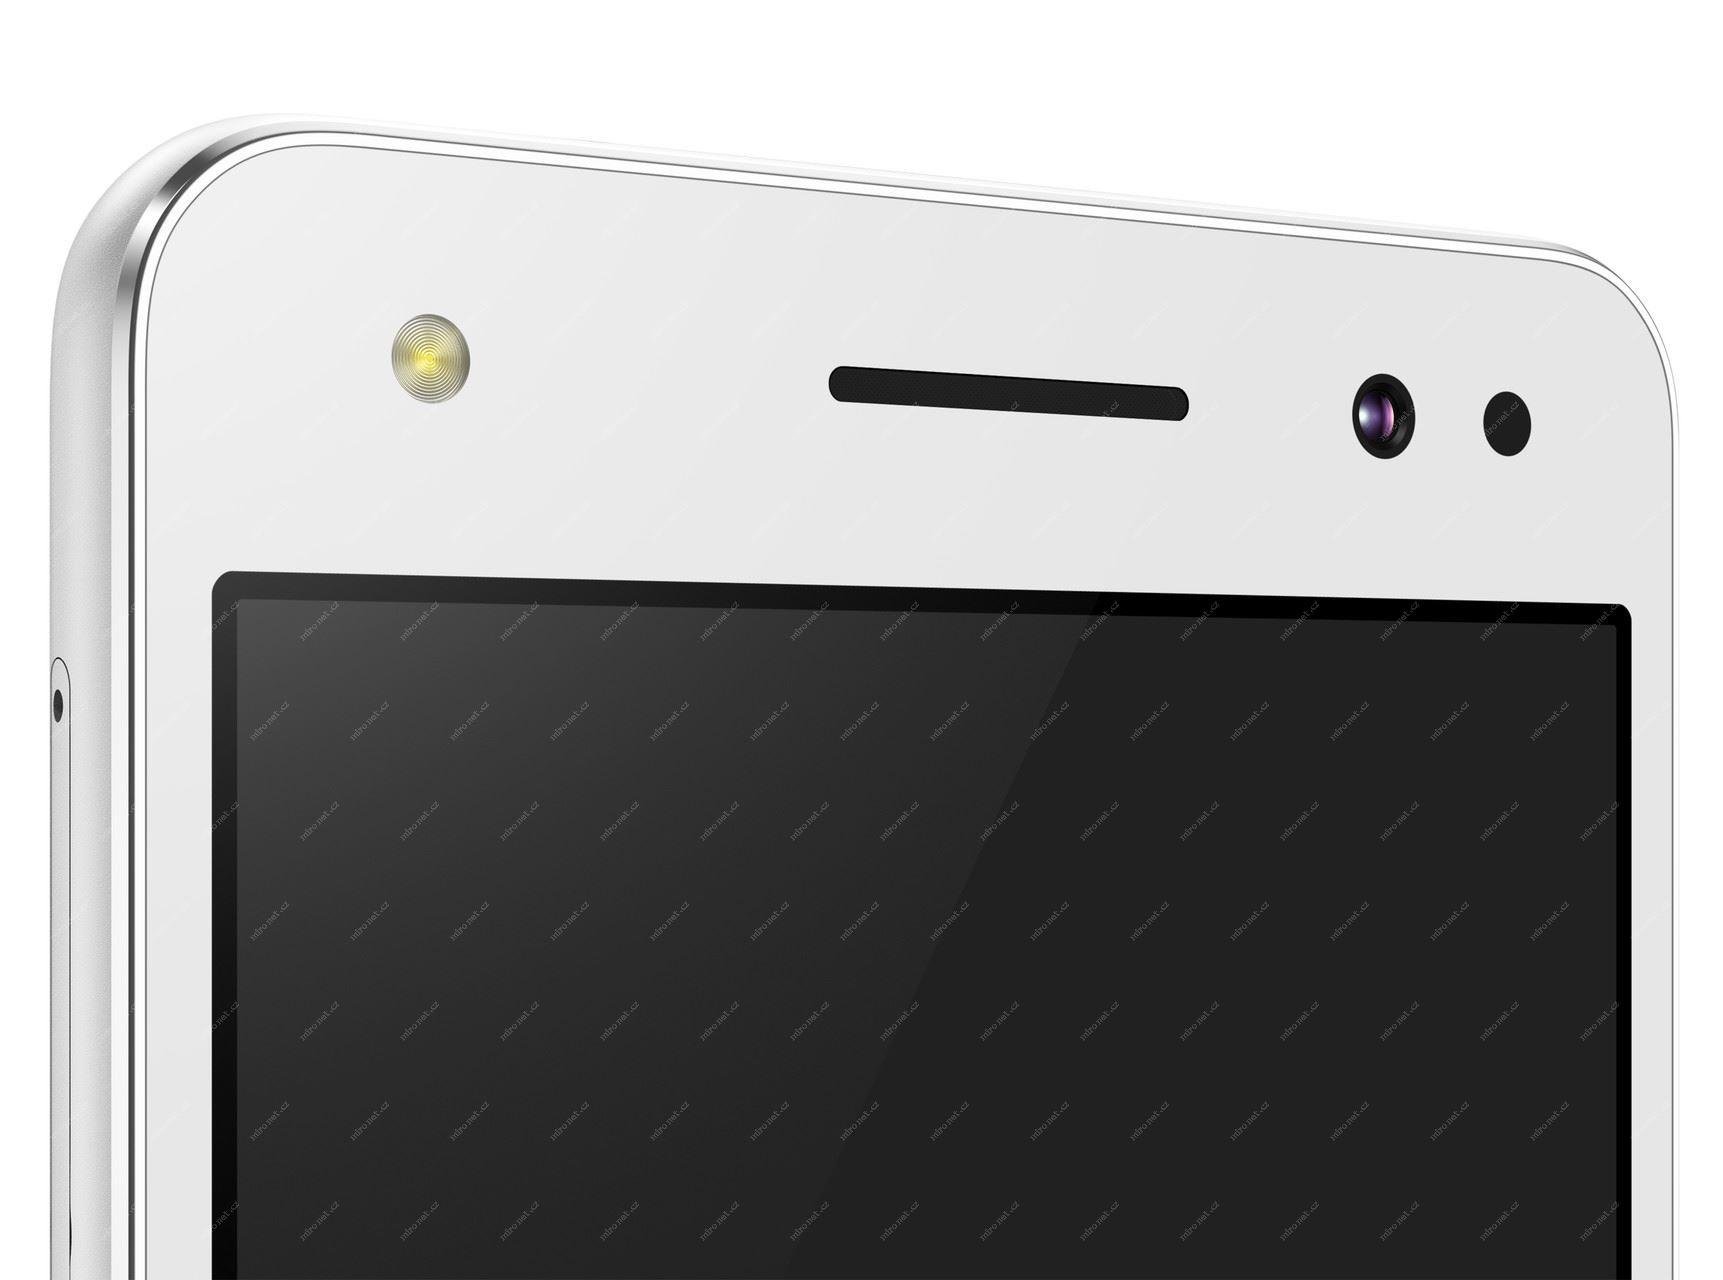 Mobiln telefon Lenovo Vibe S1 Lite